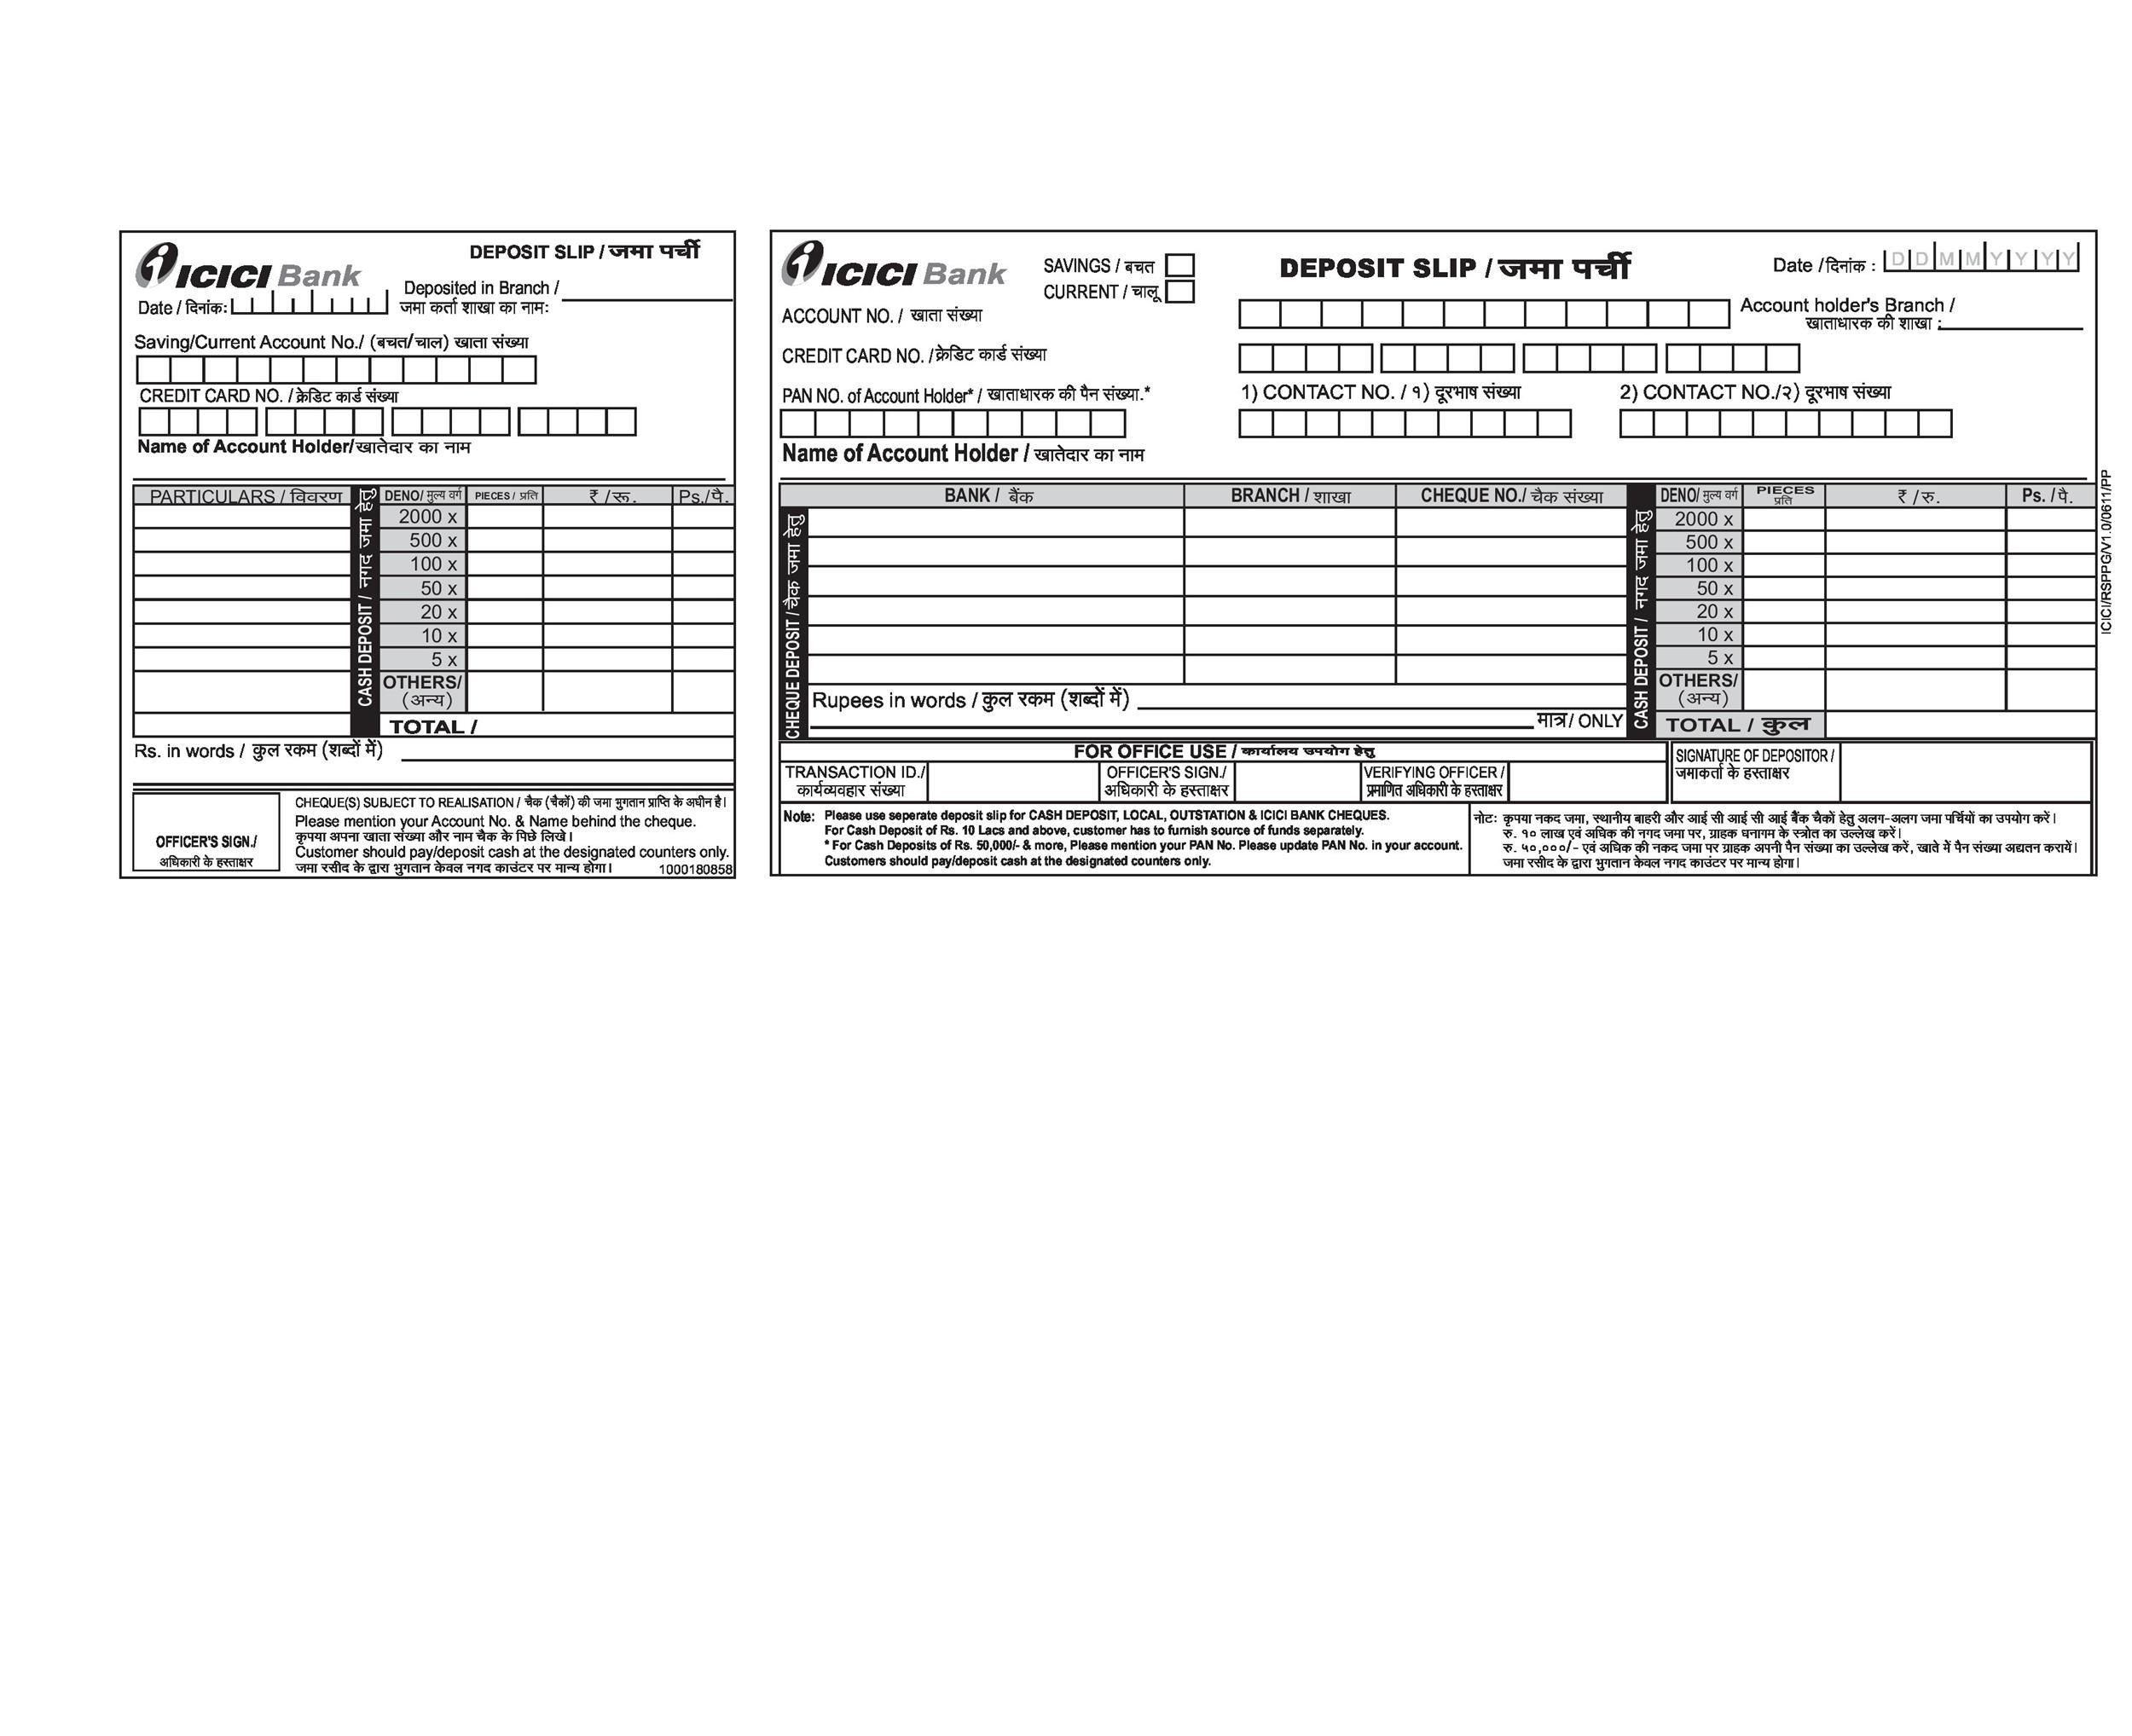 Sample Excel Templates Cheque Deposit Slip In Excel